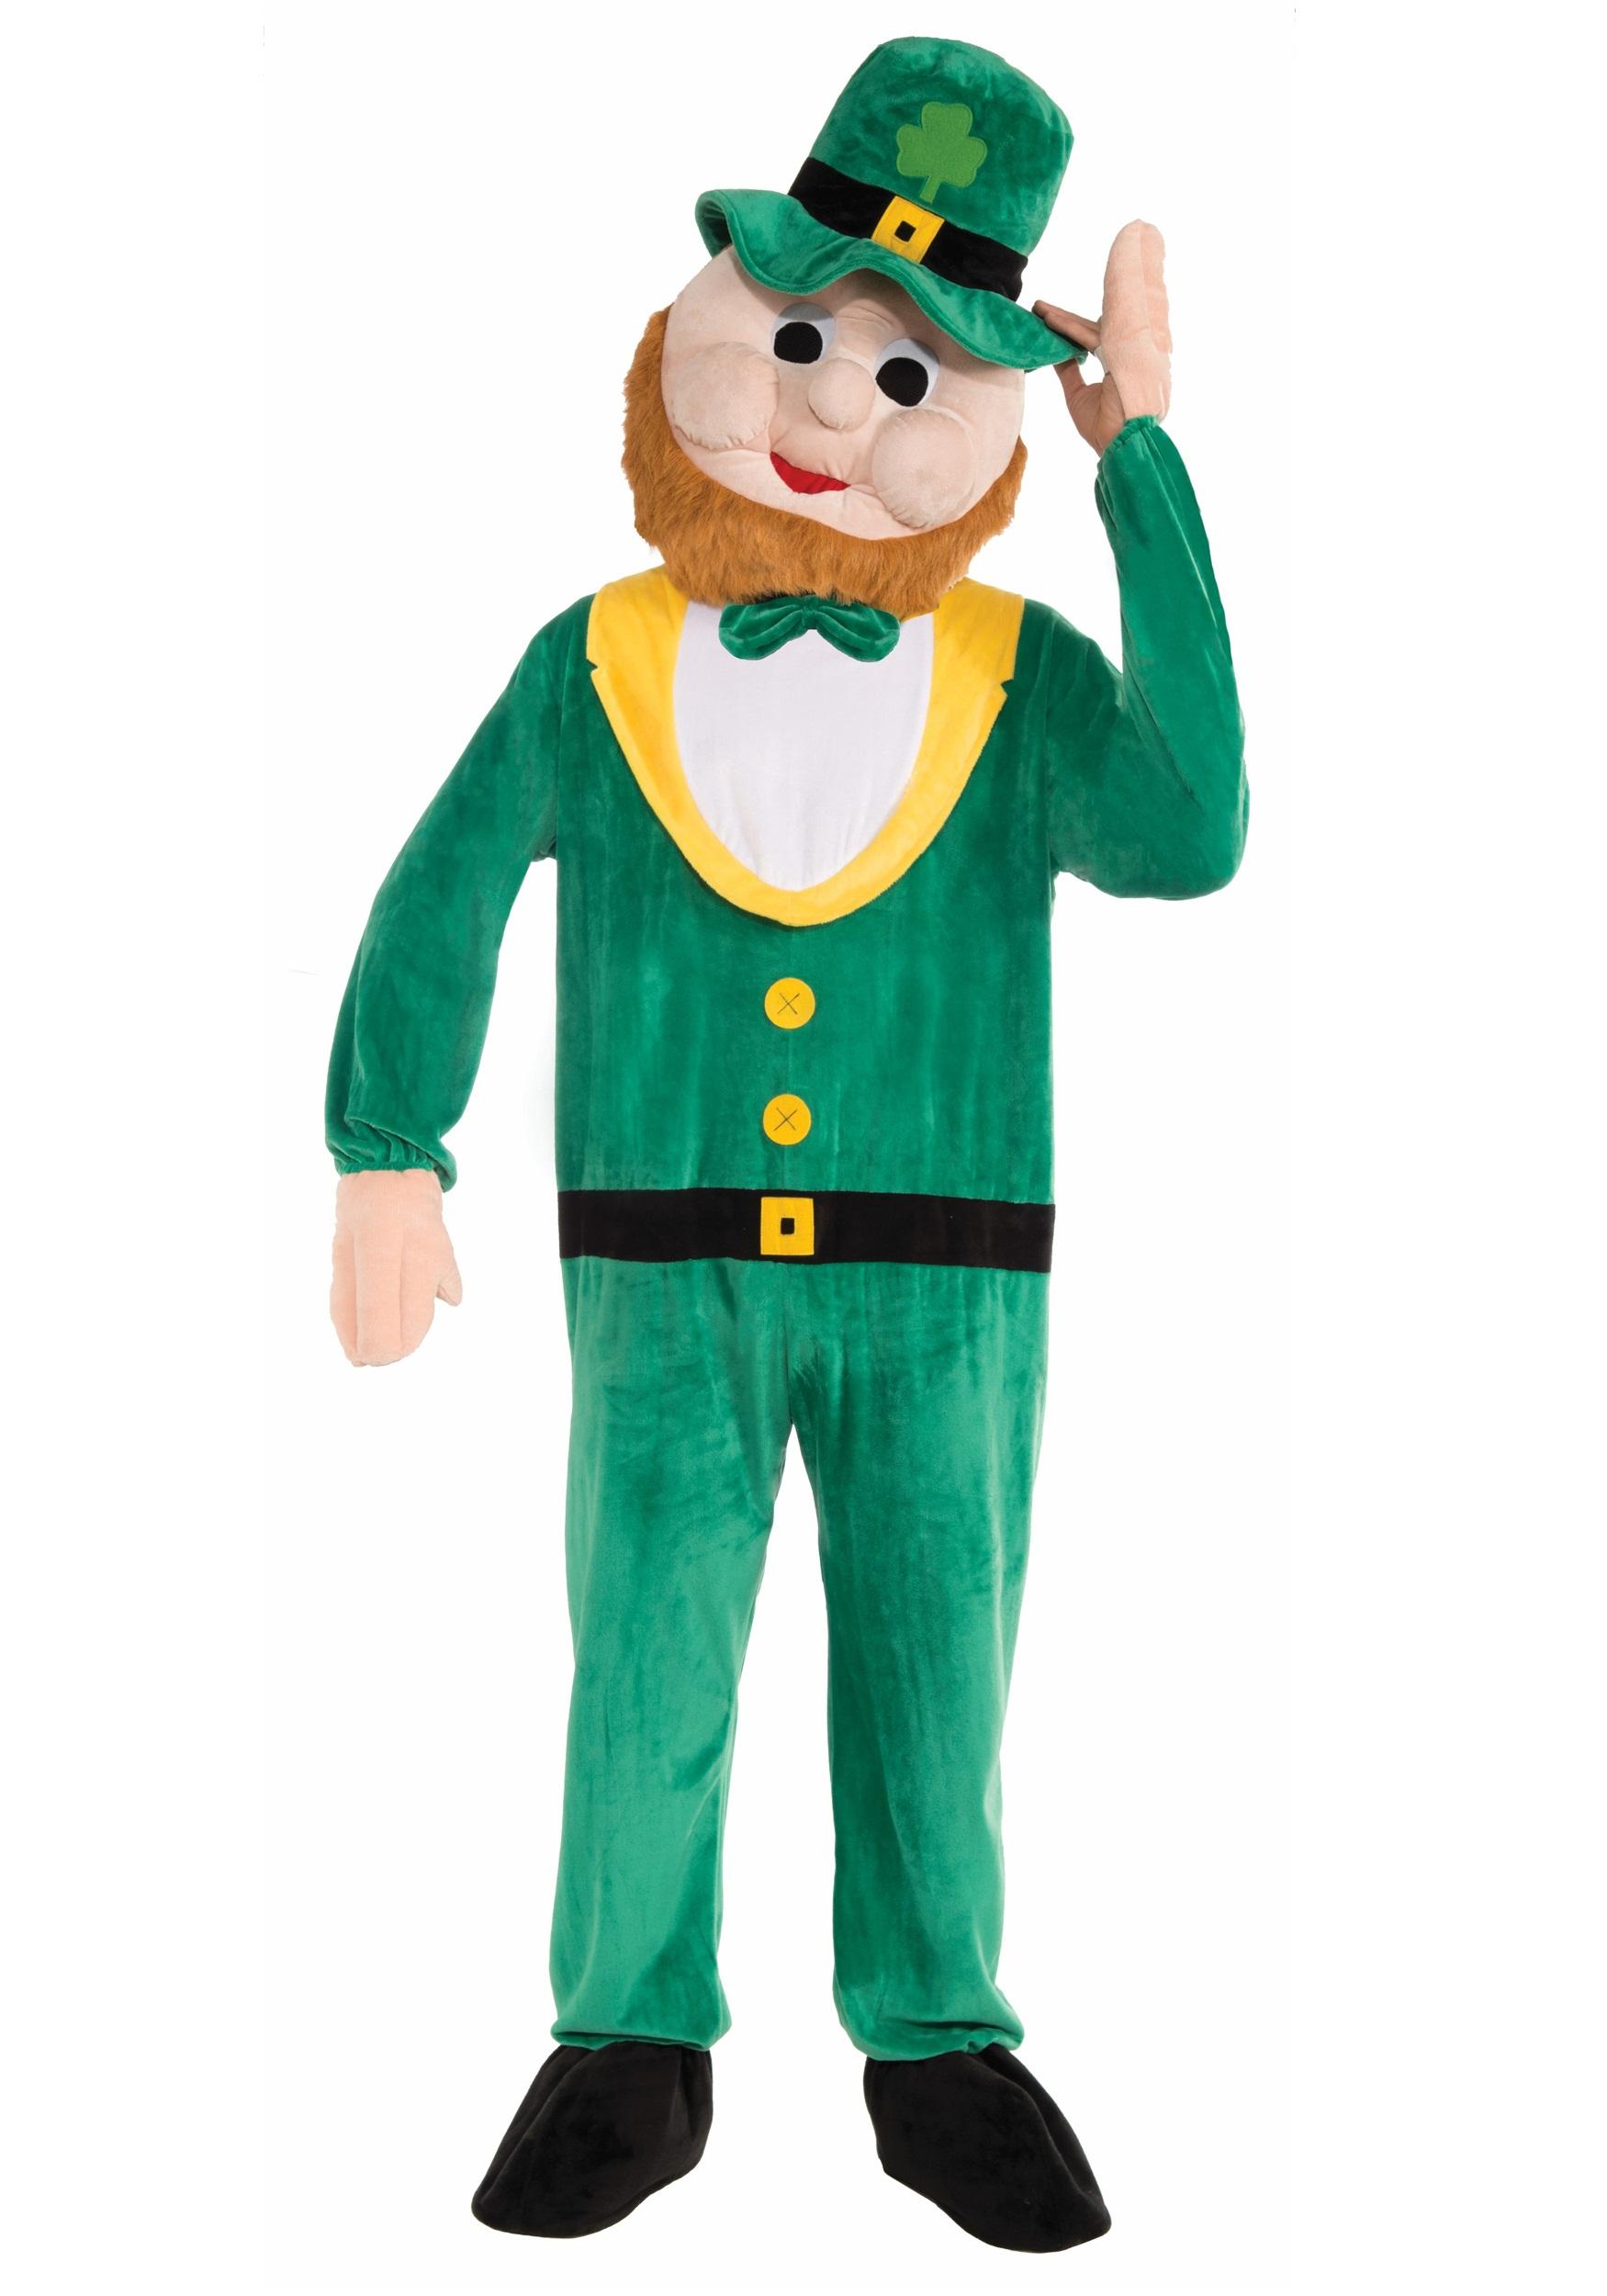 Leprechaun Irish Mascot Costume Party Character St Patrick Lucky Charm Halloween